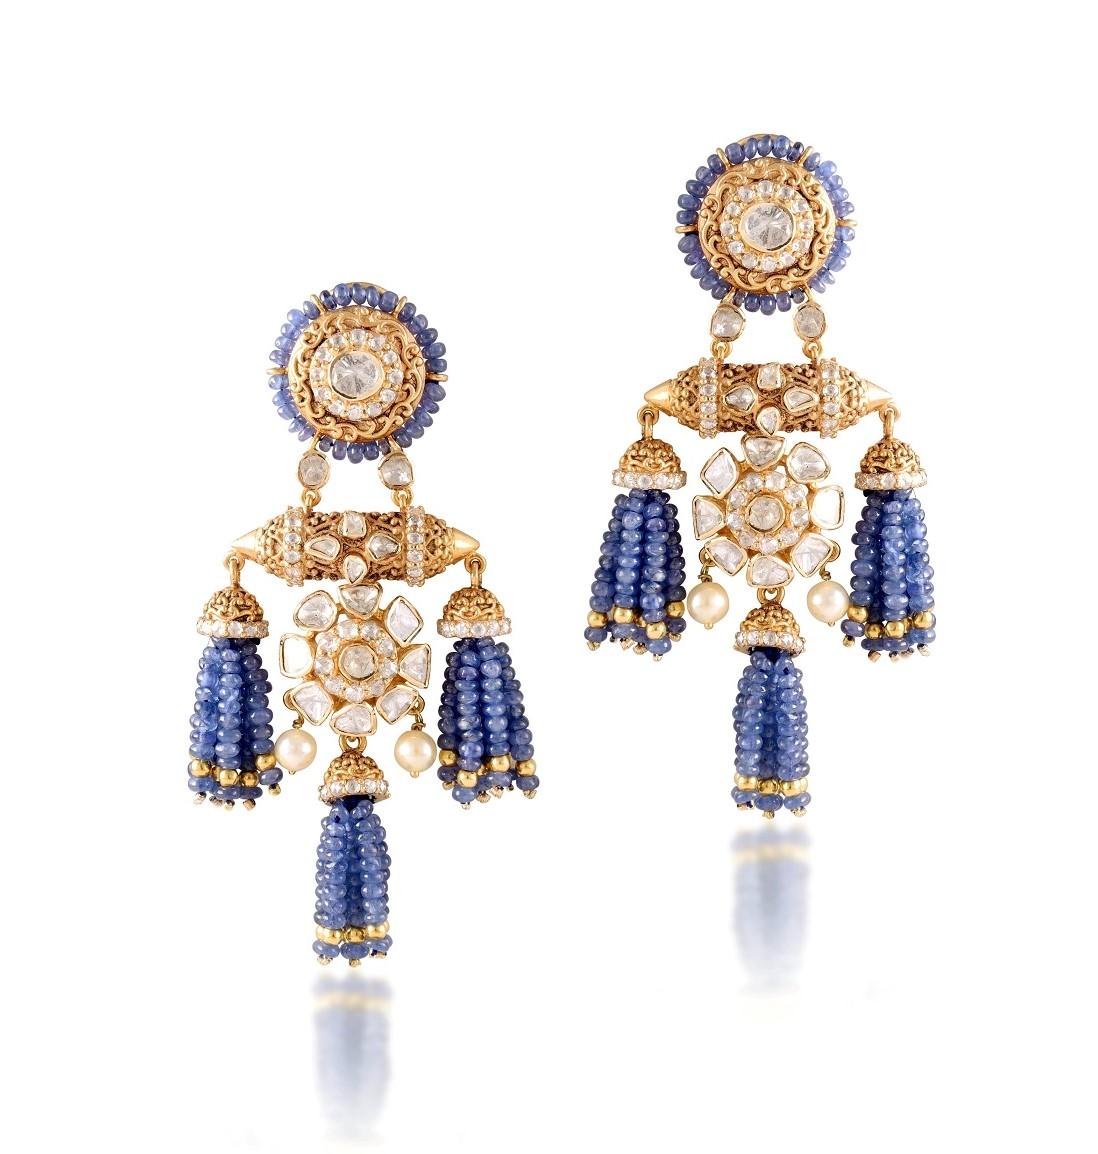 traditional earrings for wedding